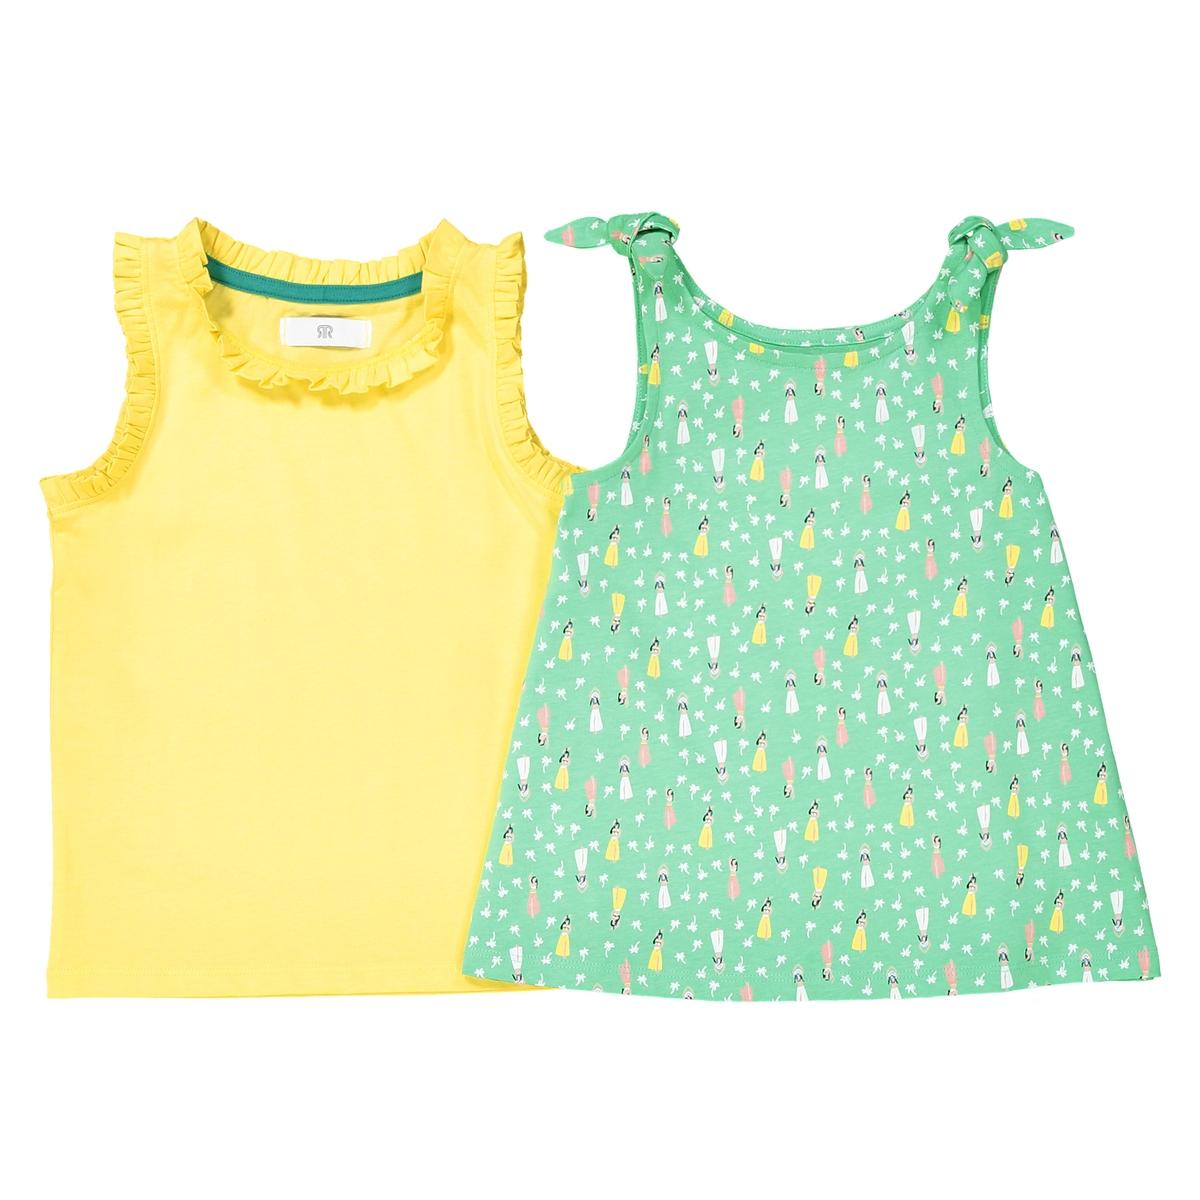 Комплект из футболки и топа 3-12 лет 2 футболки 3 12 лет